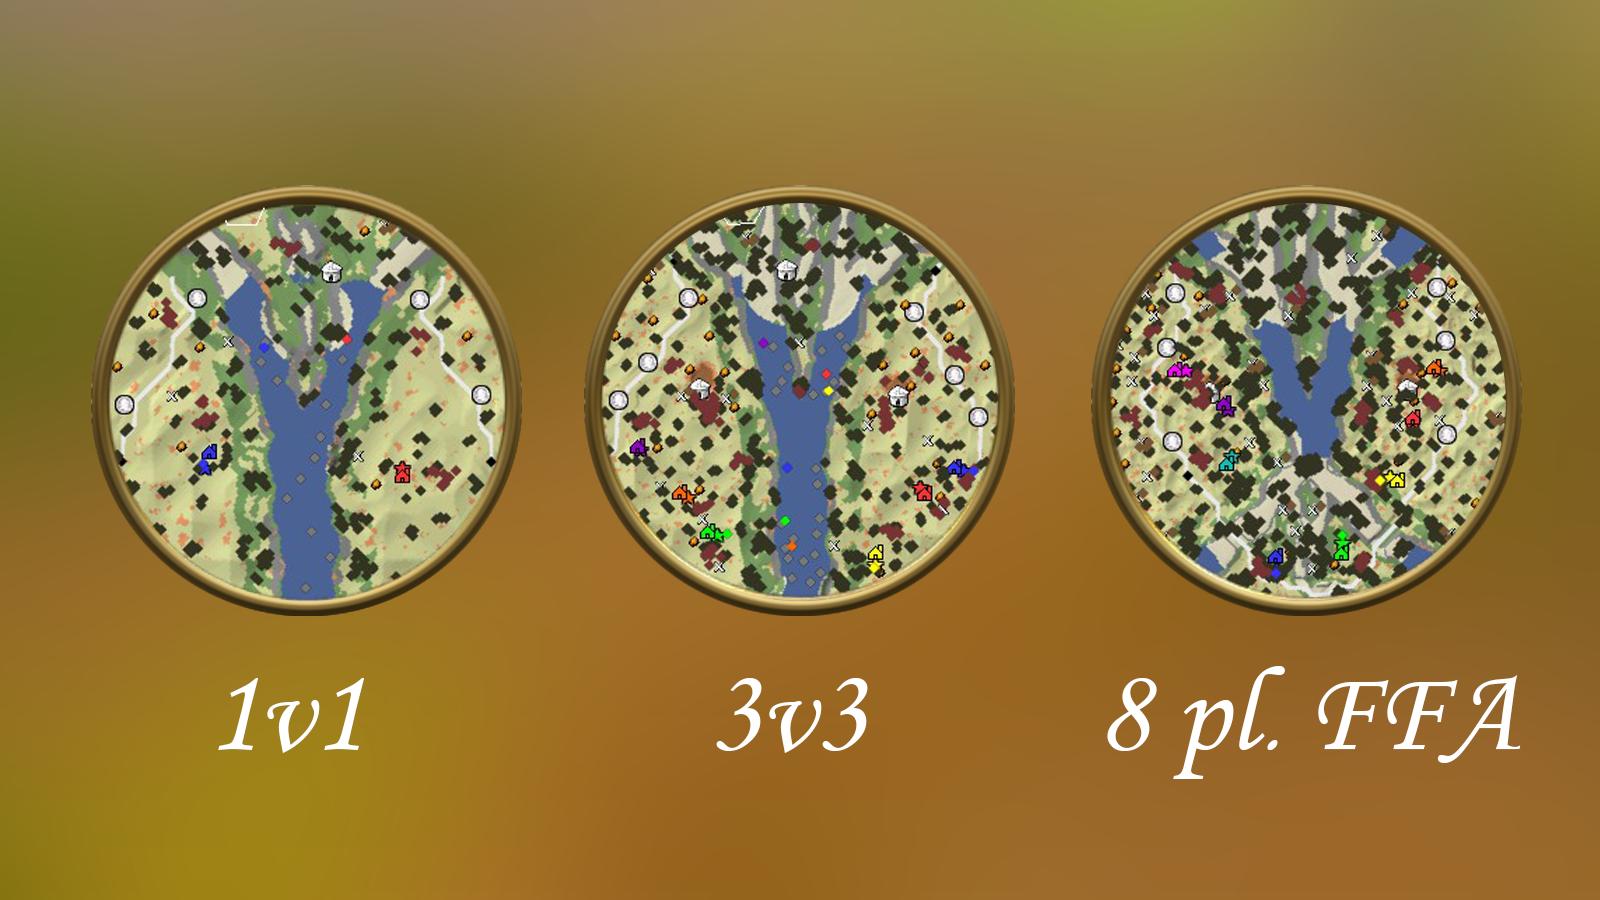 Minimaps in different configurations